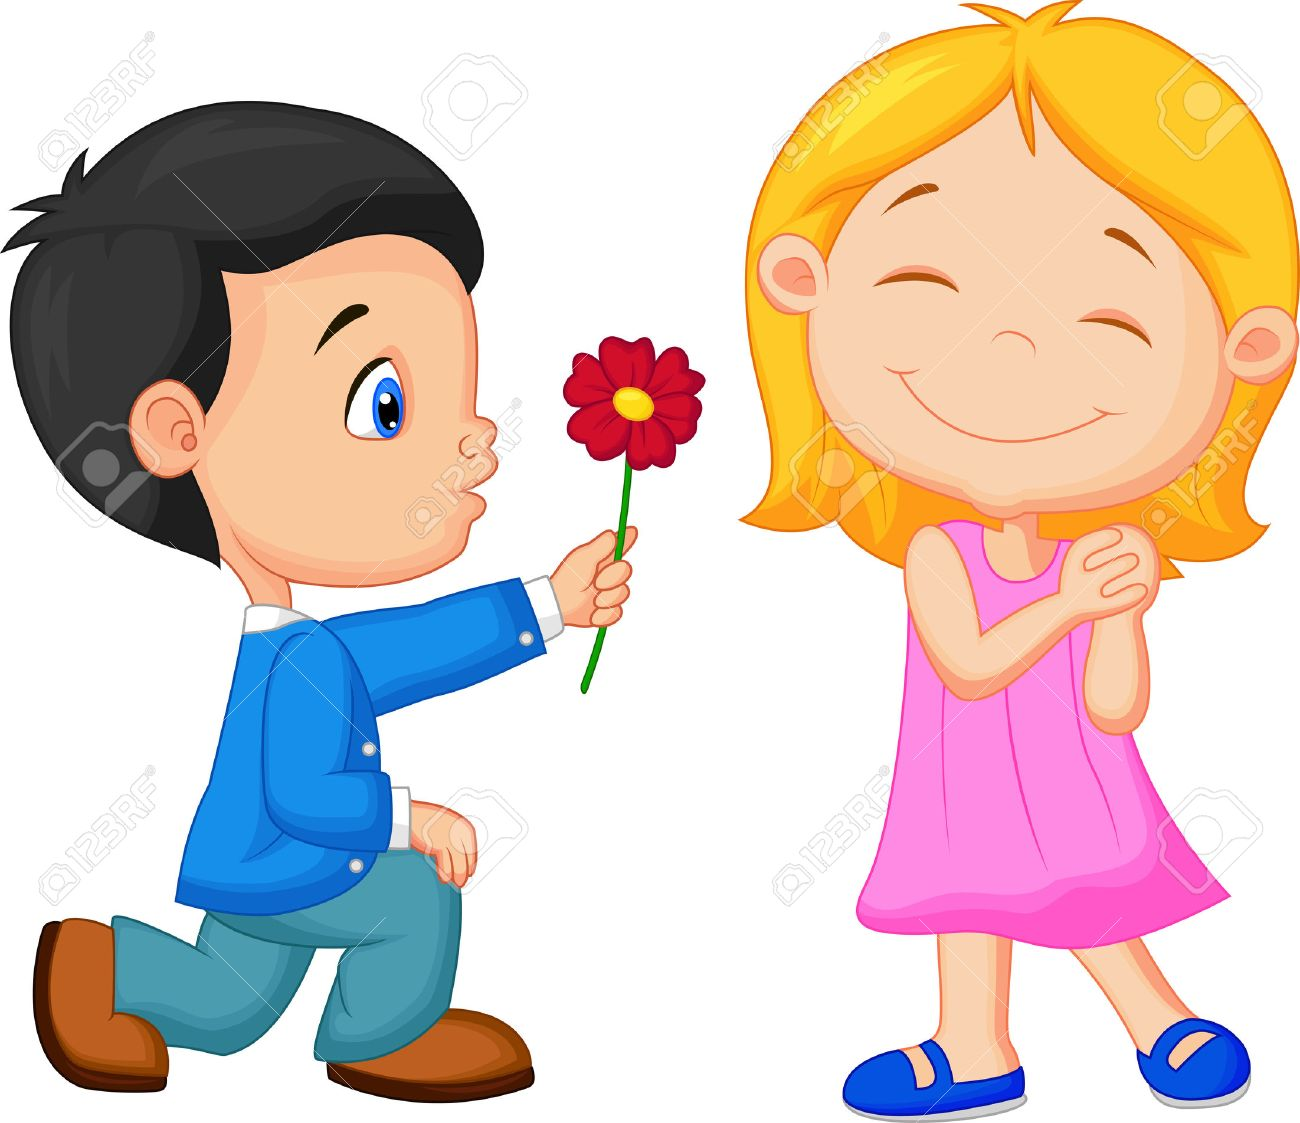 Lượm từ FB 27166460-cartoon-little-boy-kneels-on-one-knee-giving-flowers-to-girl